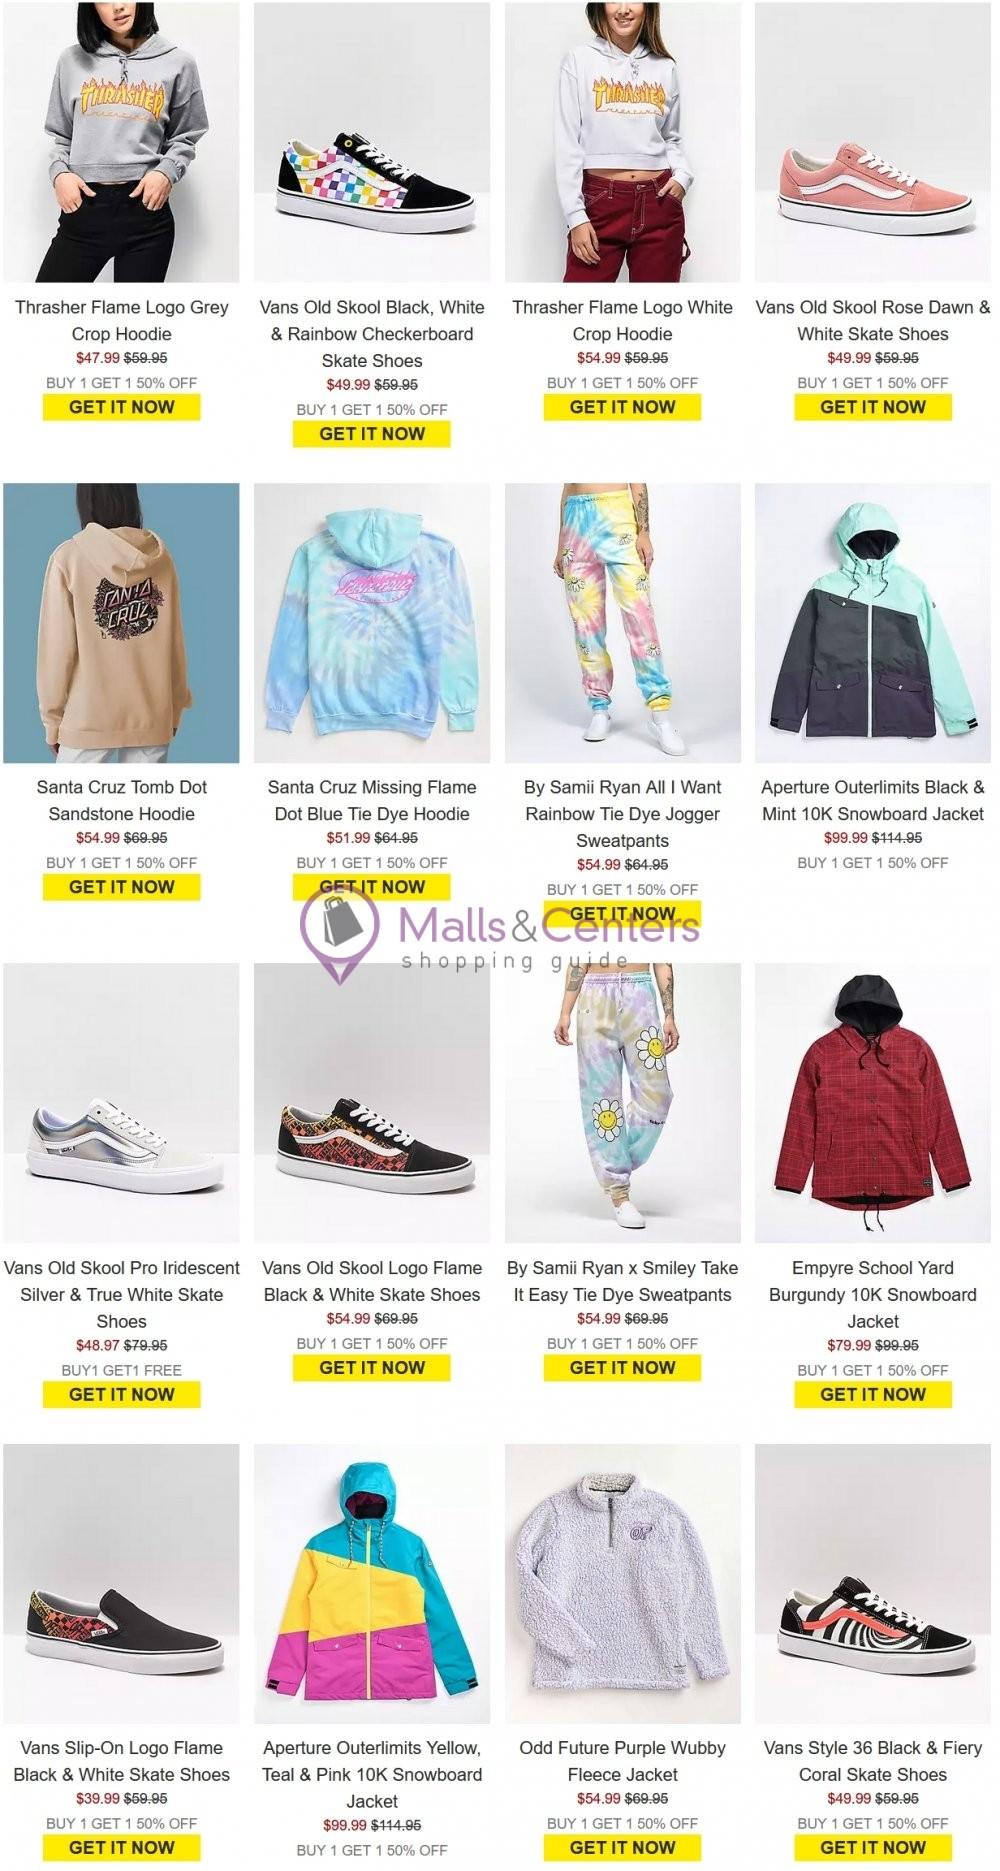 weekly ads Zumiez - page 1 - mallscenters.com